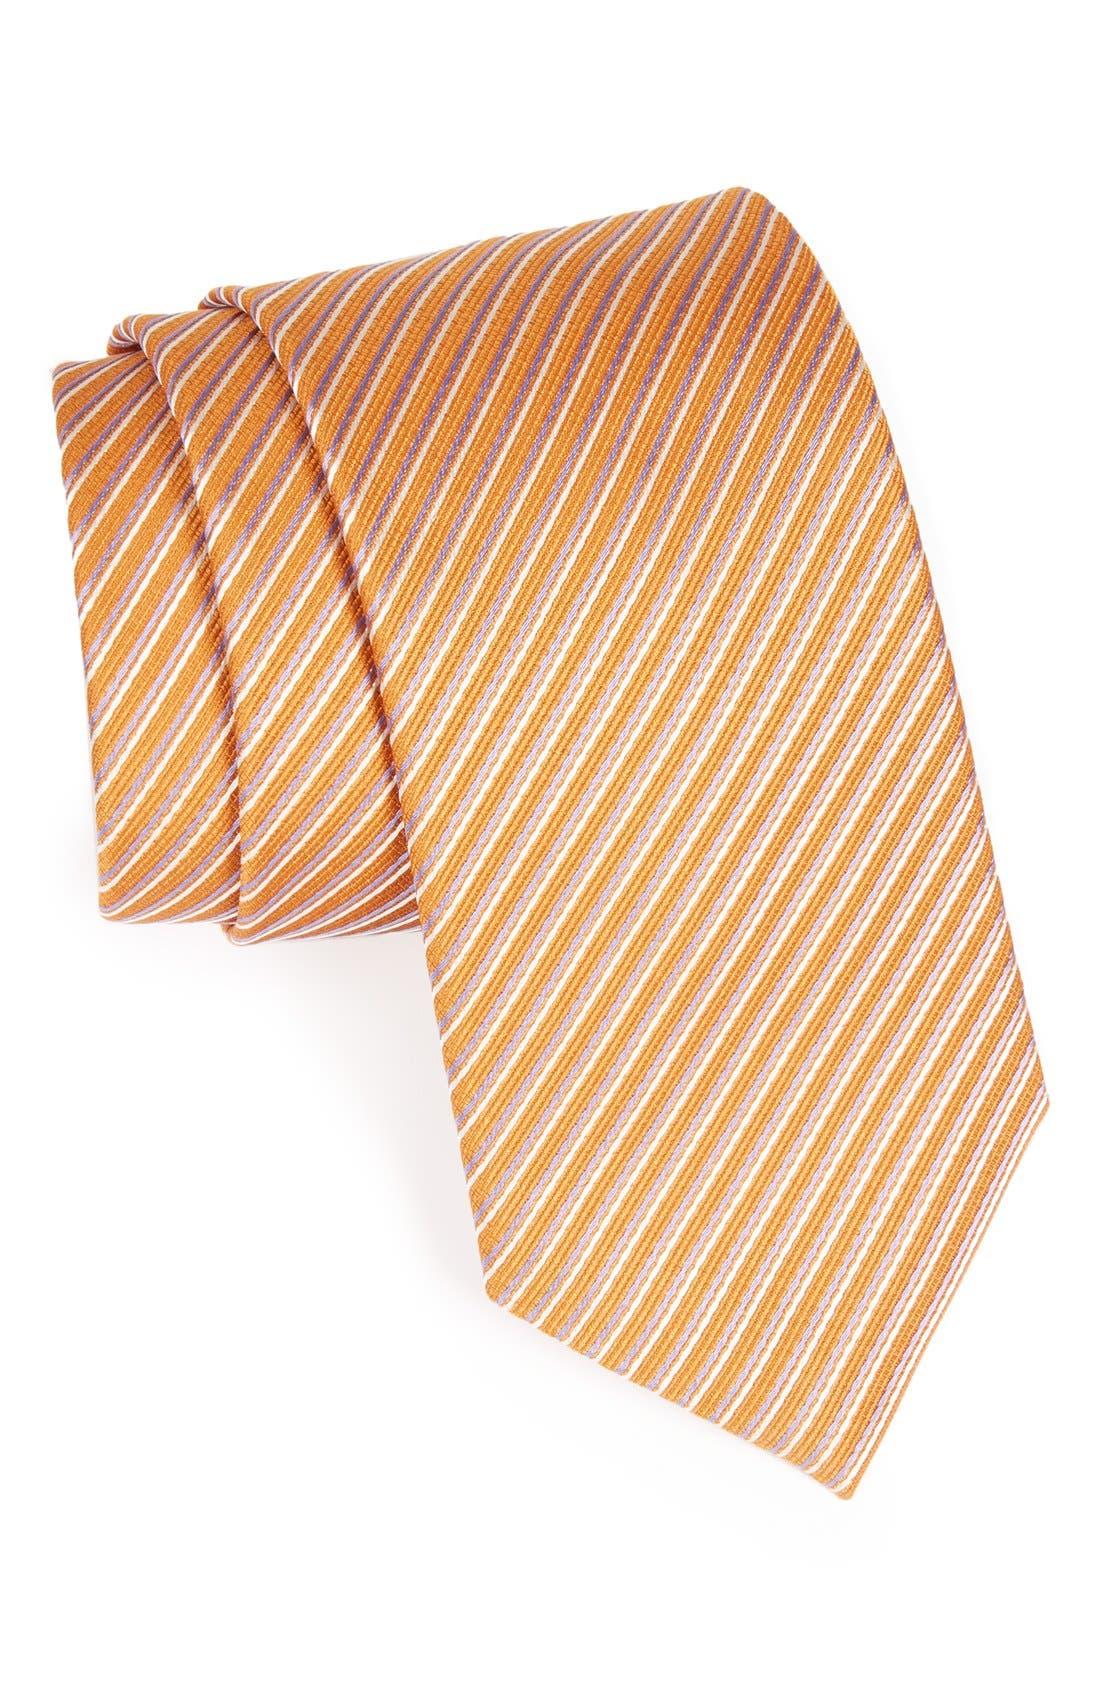 Main Image - BOSS Hugo Boss Stripe Woven Silk Tie